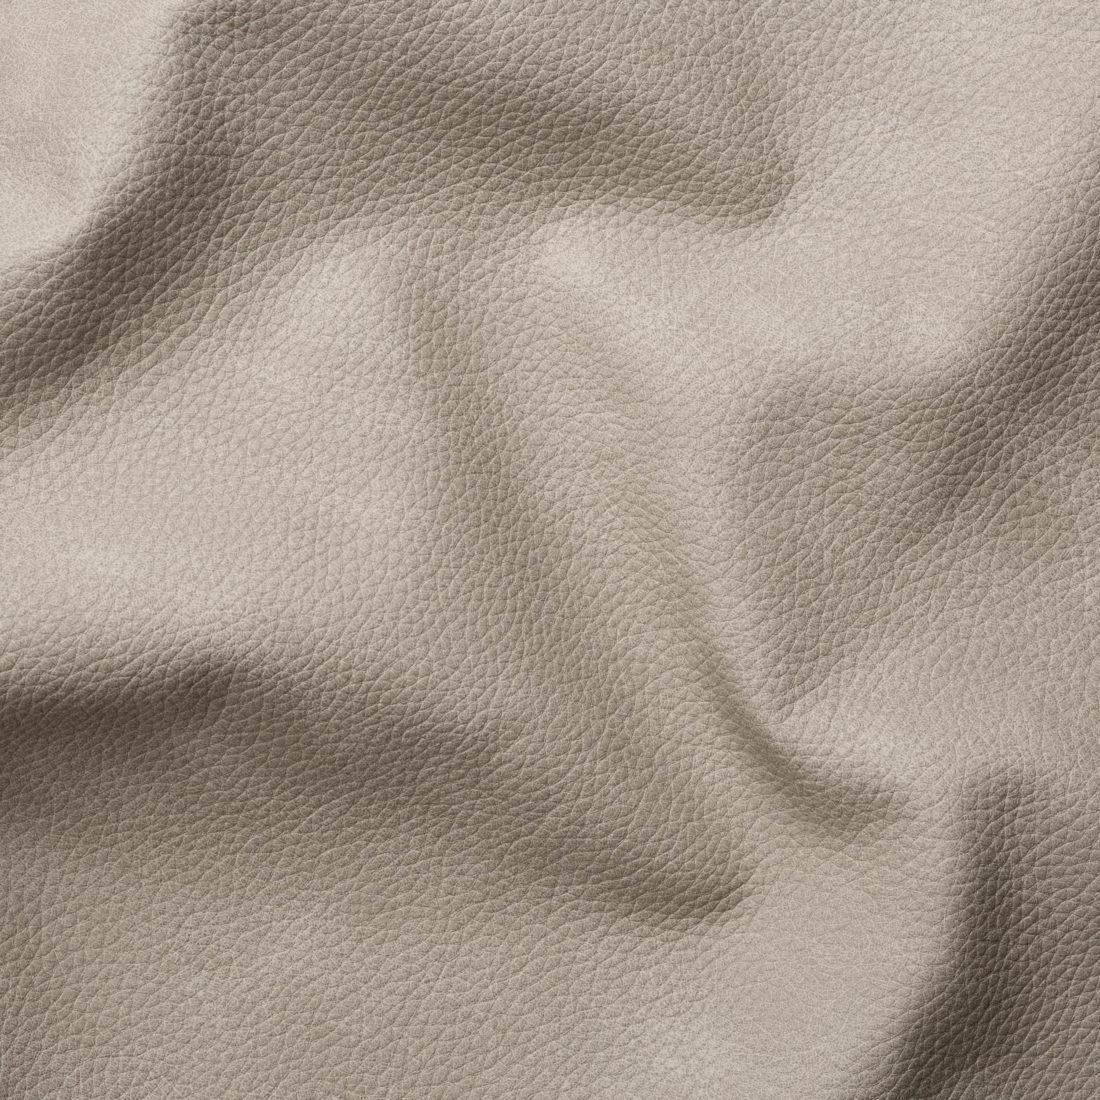 Меблева тканина Wave 102 Rabbit, штучна шкіра